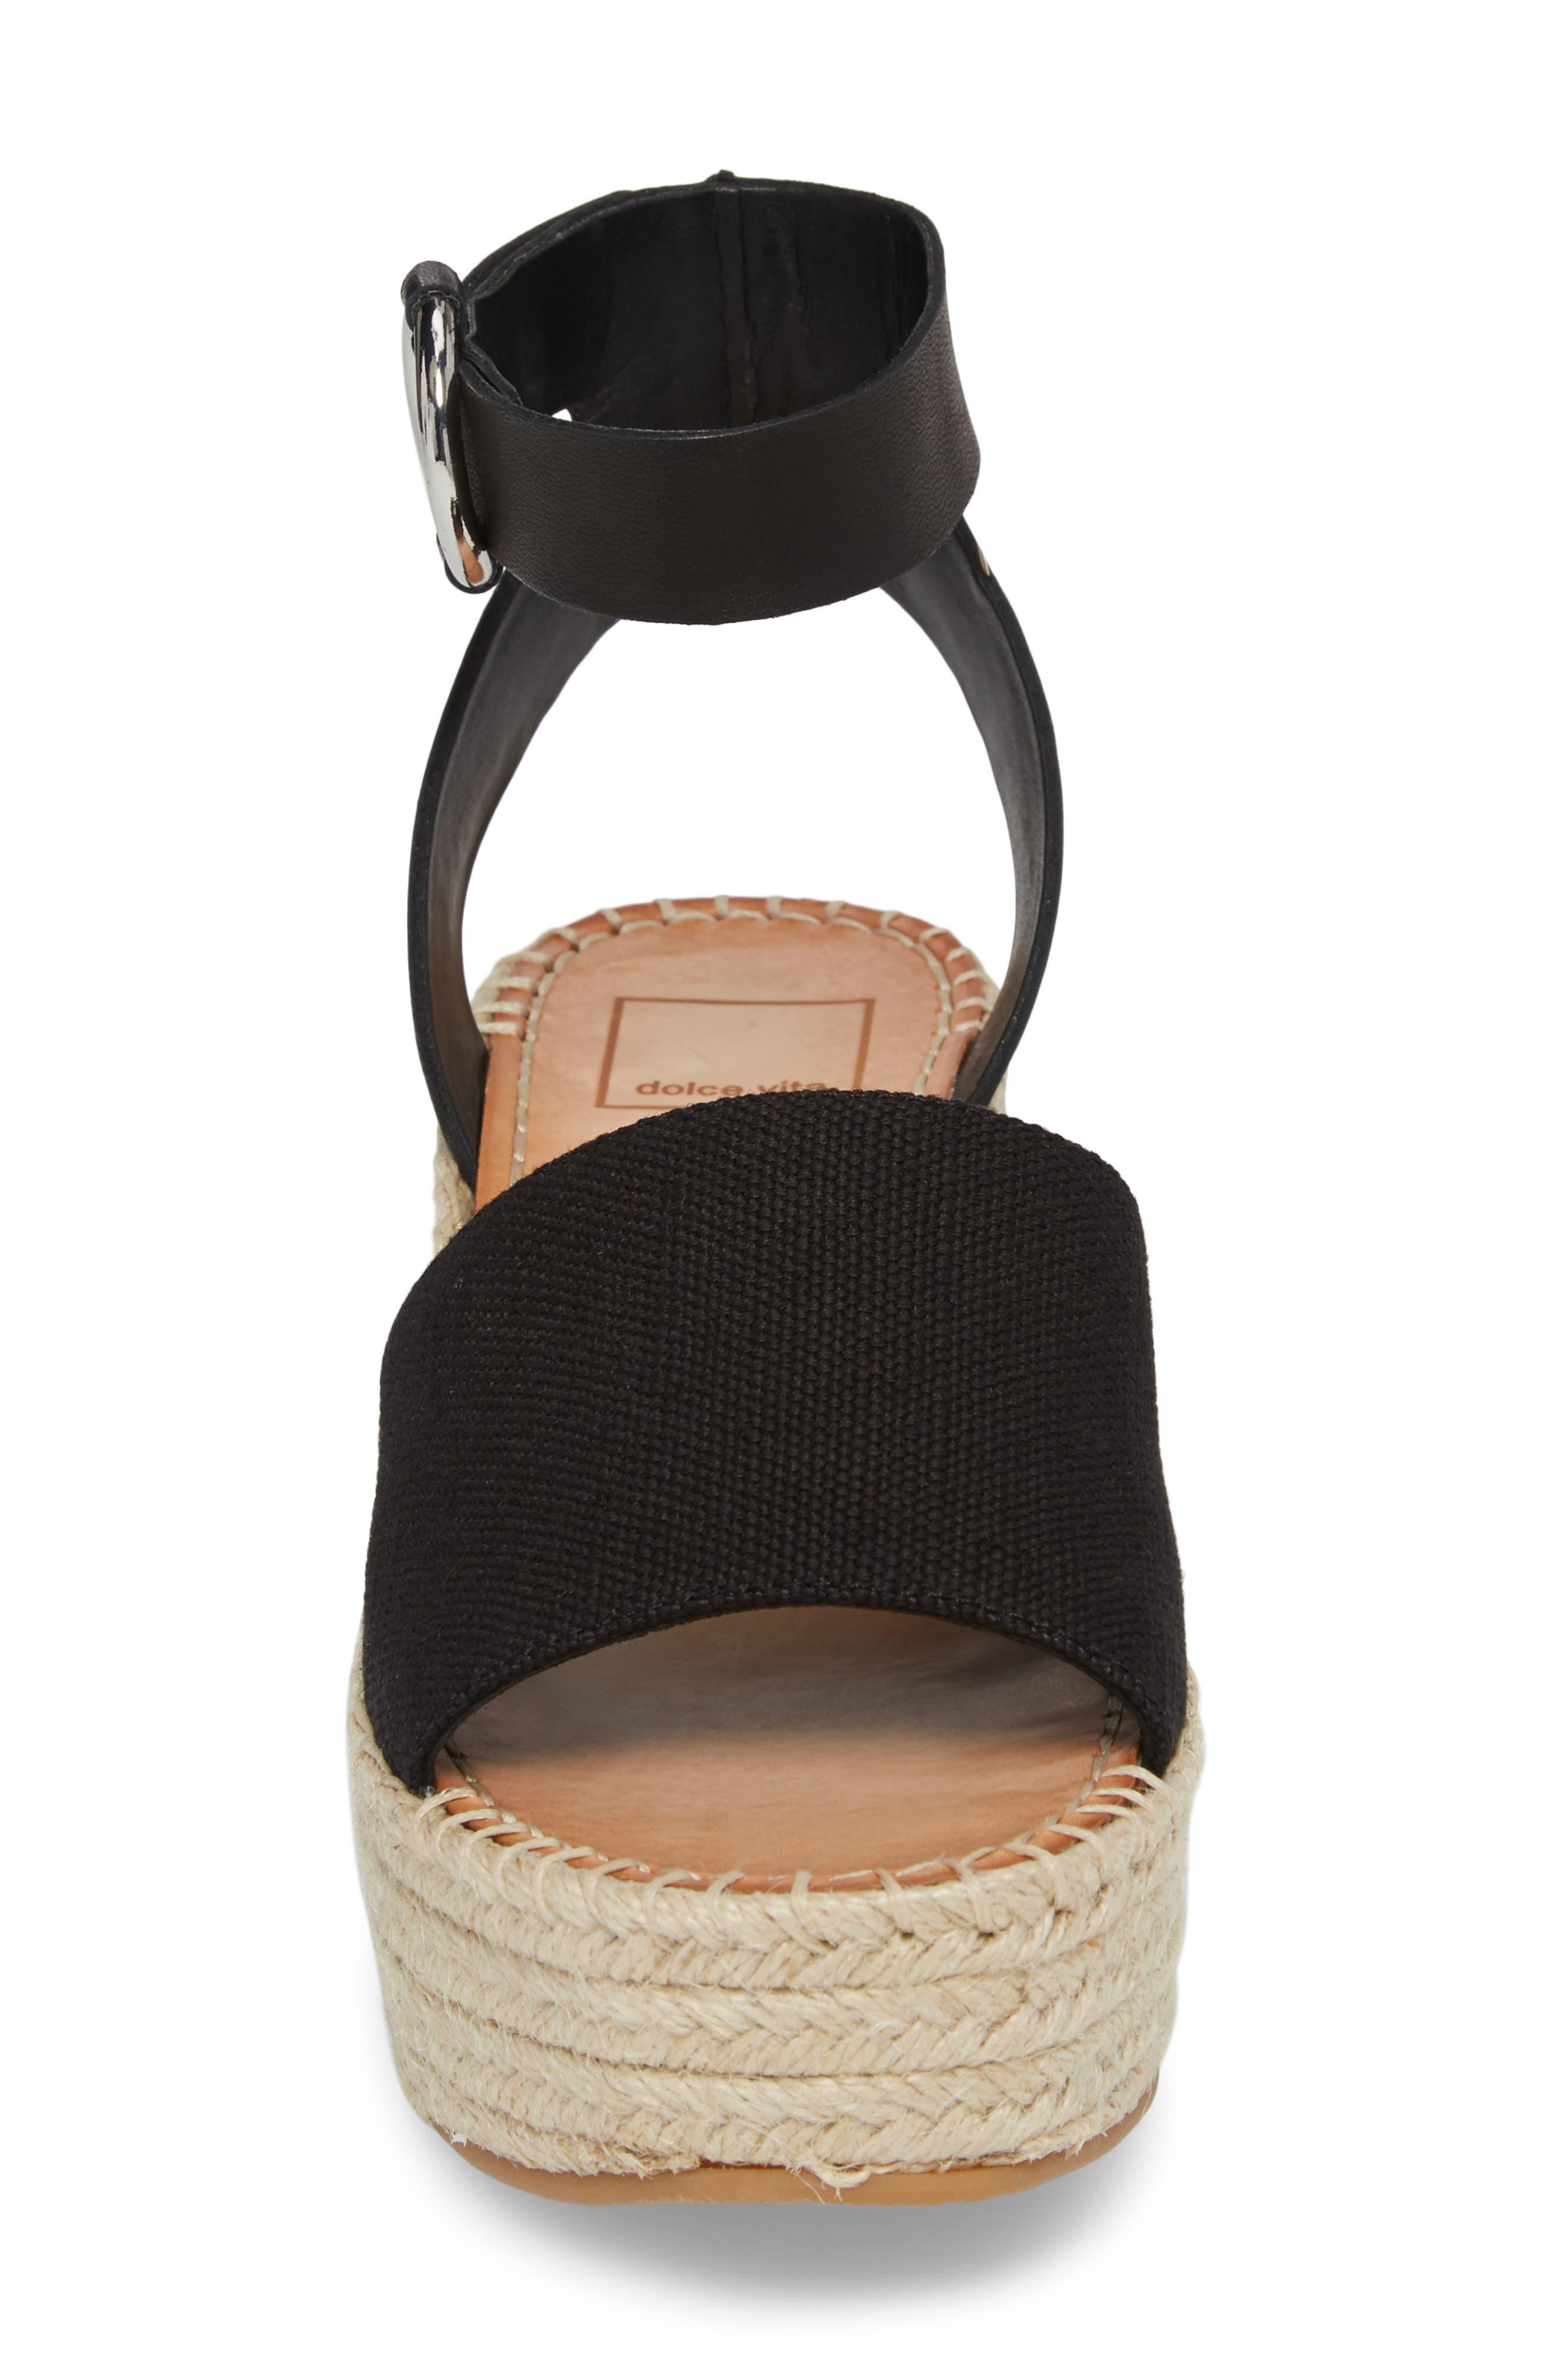 DOLCE VITA, Lesly Espadrille Platform Sandal, Alternate thumbnail 4, color, 001